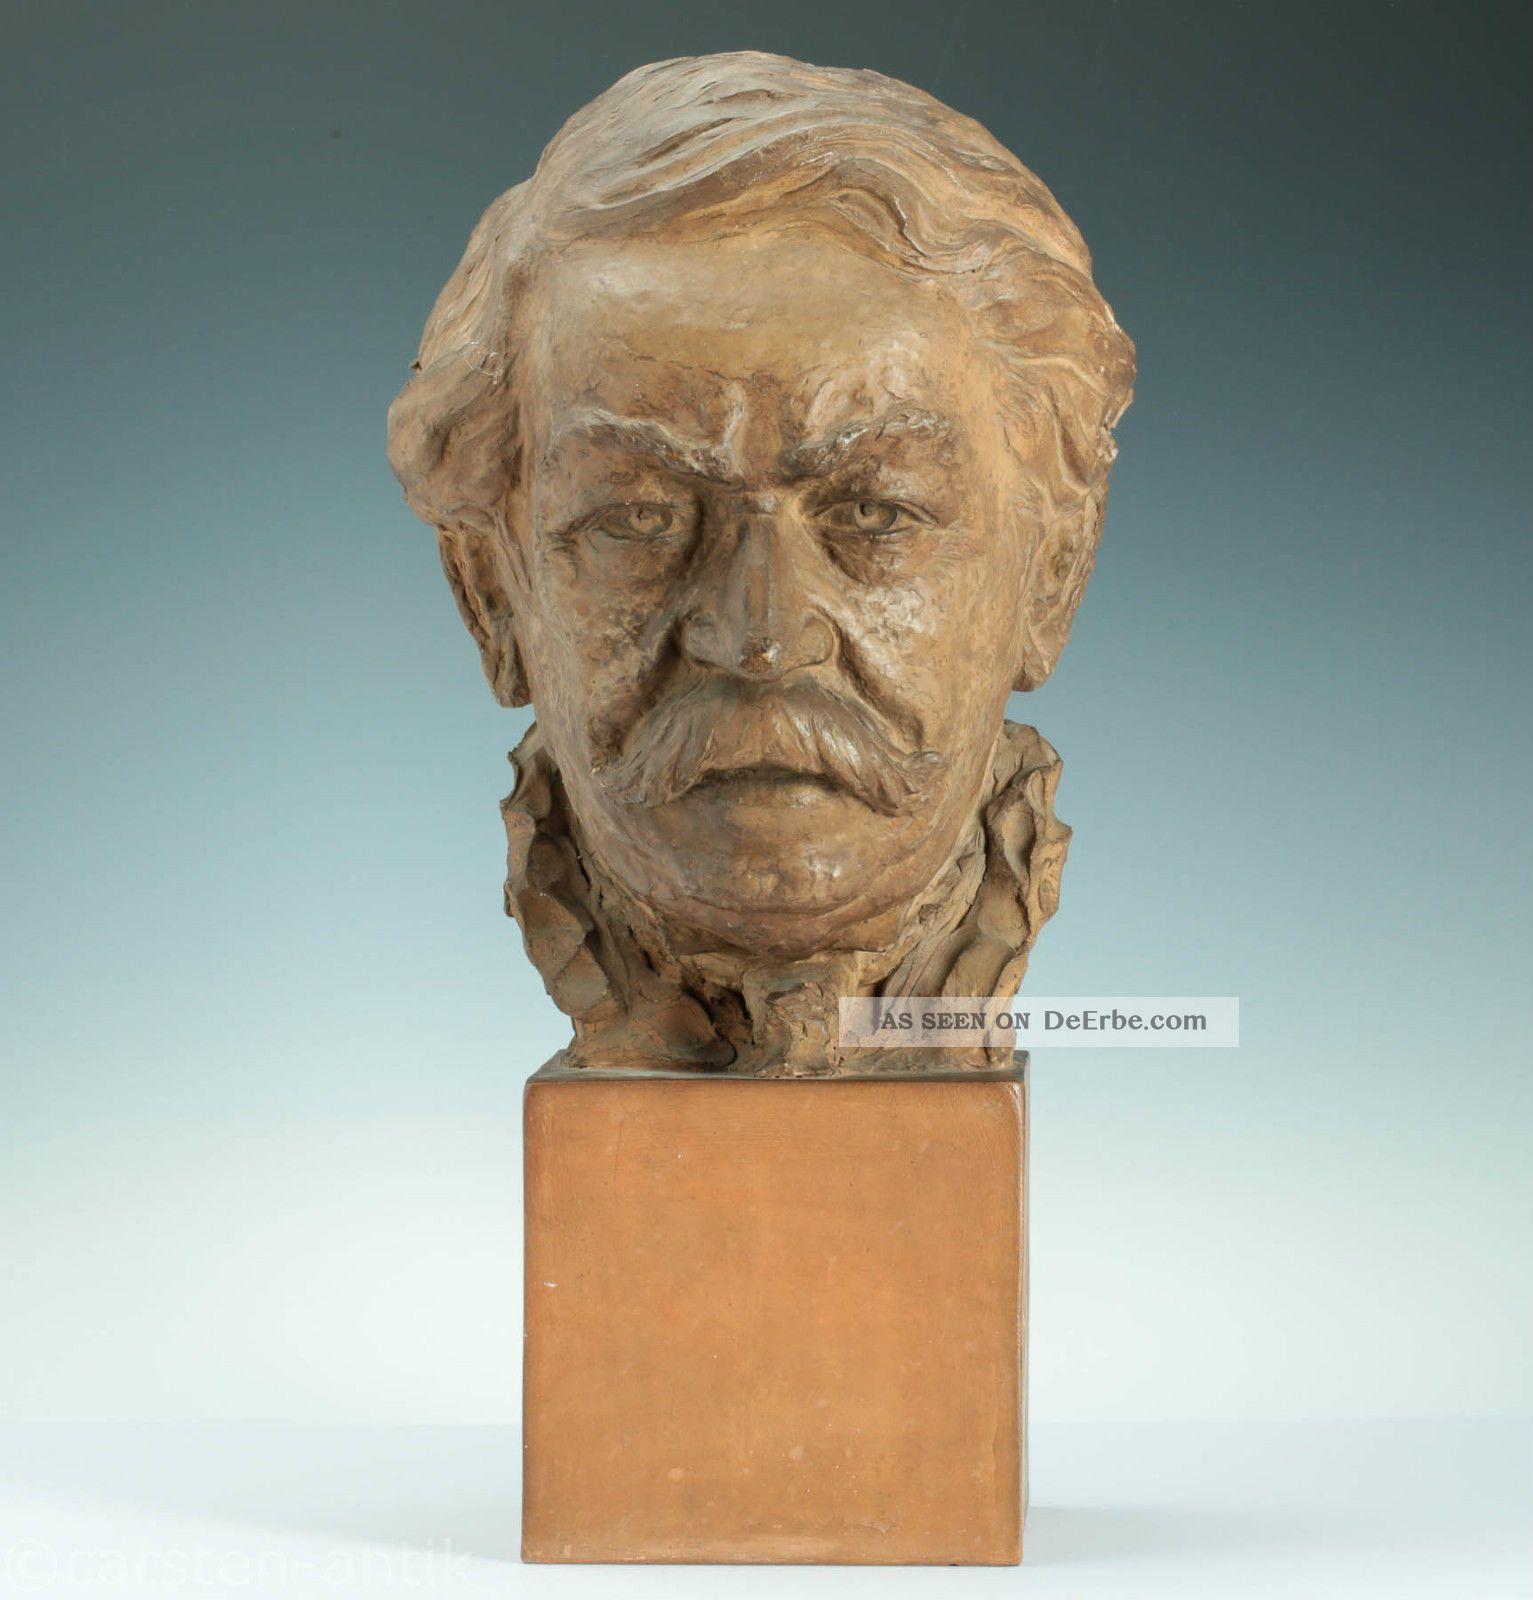 Lebensgroße & Handmodellierte Terracotta Büste G.  Regnauld Frankreich 1900 Bust 1900-1949 Bild